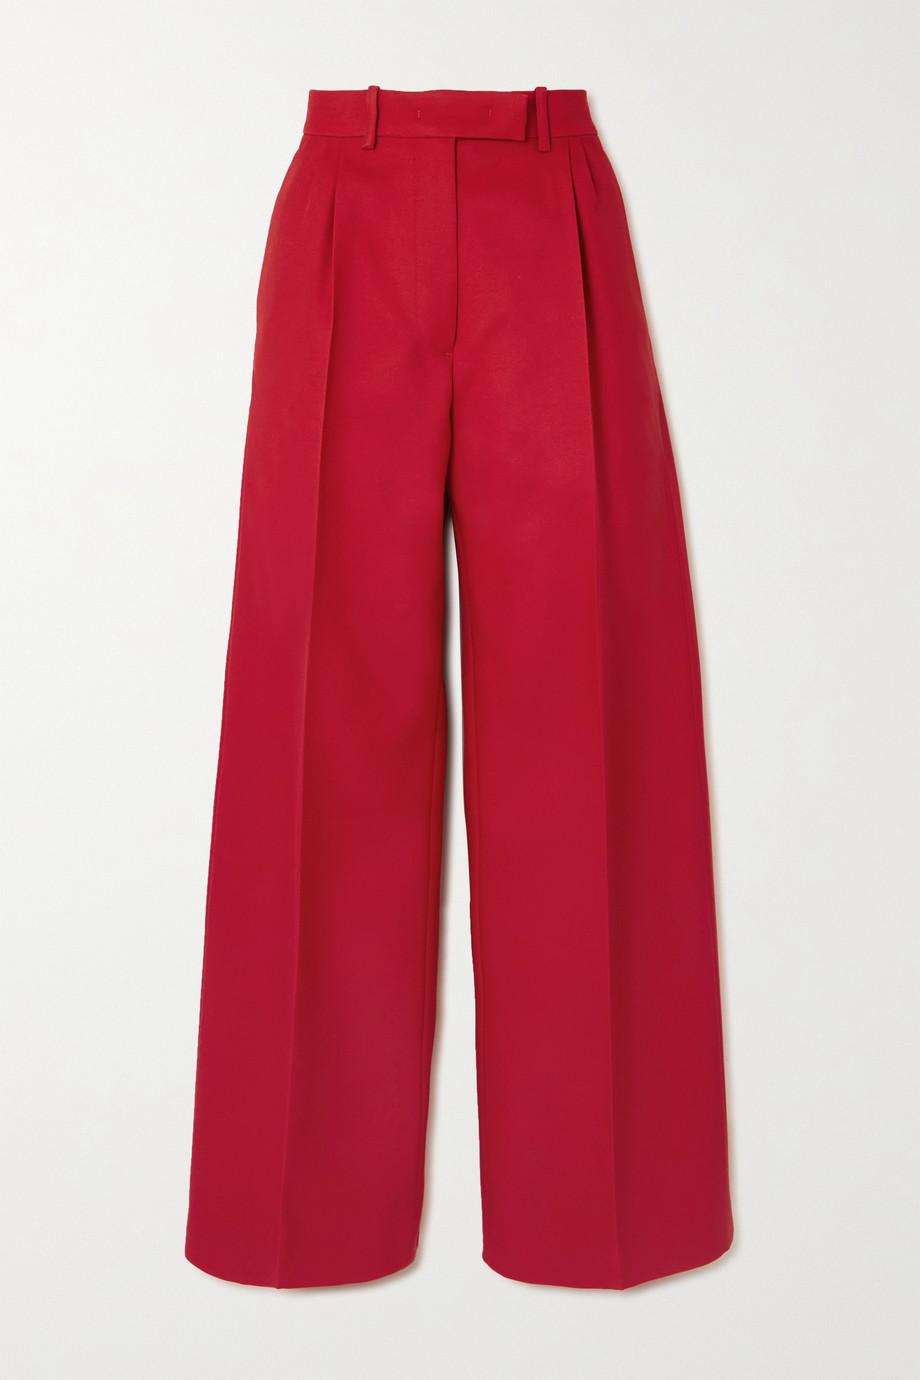 Fendi Grain de poudre wool-blend wide-leg pants